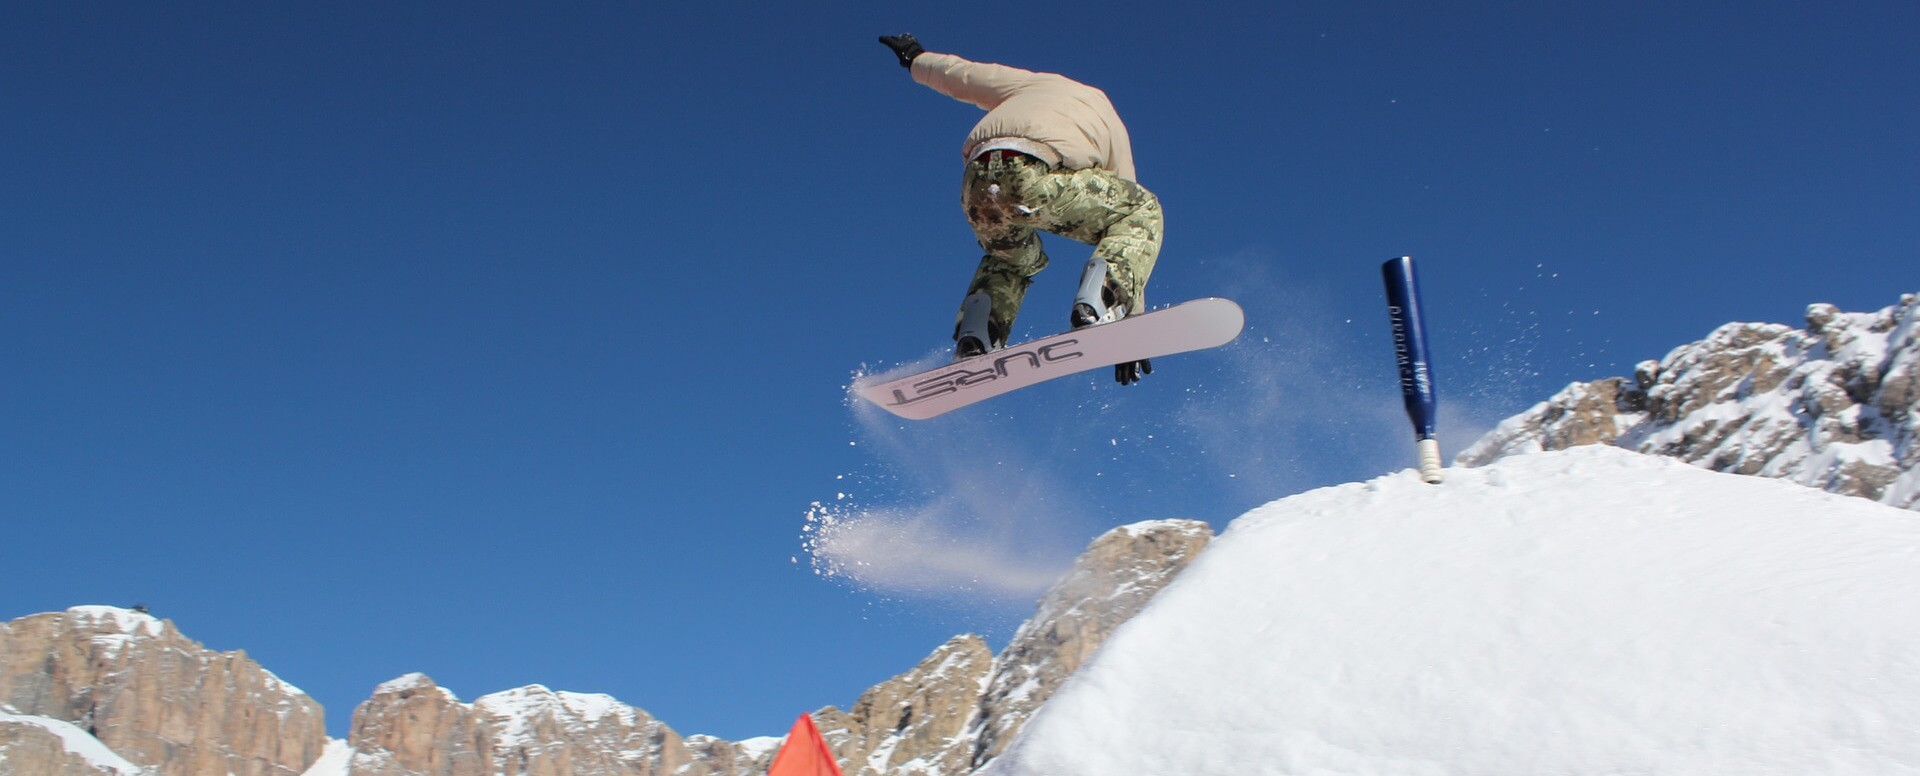 Faire du snowboard - Italie